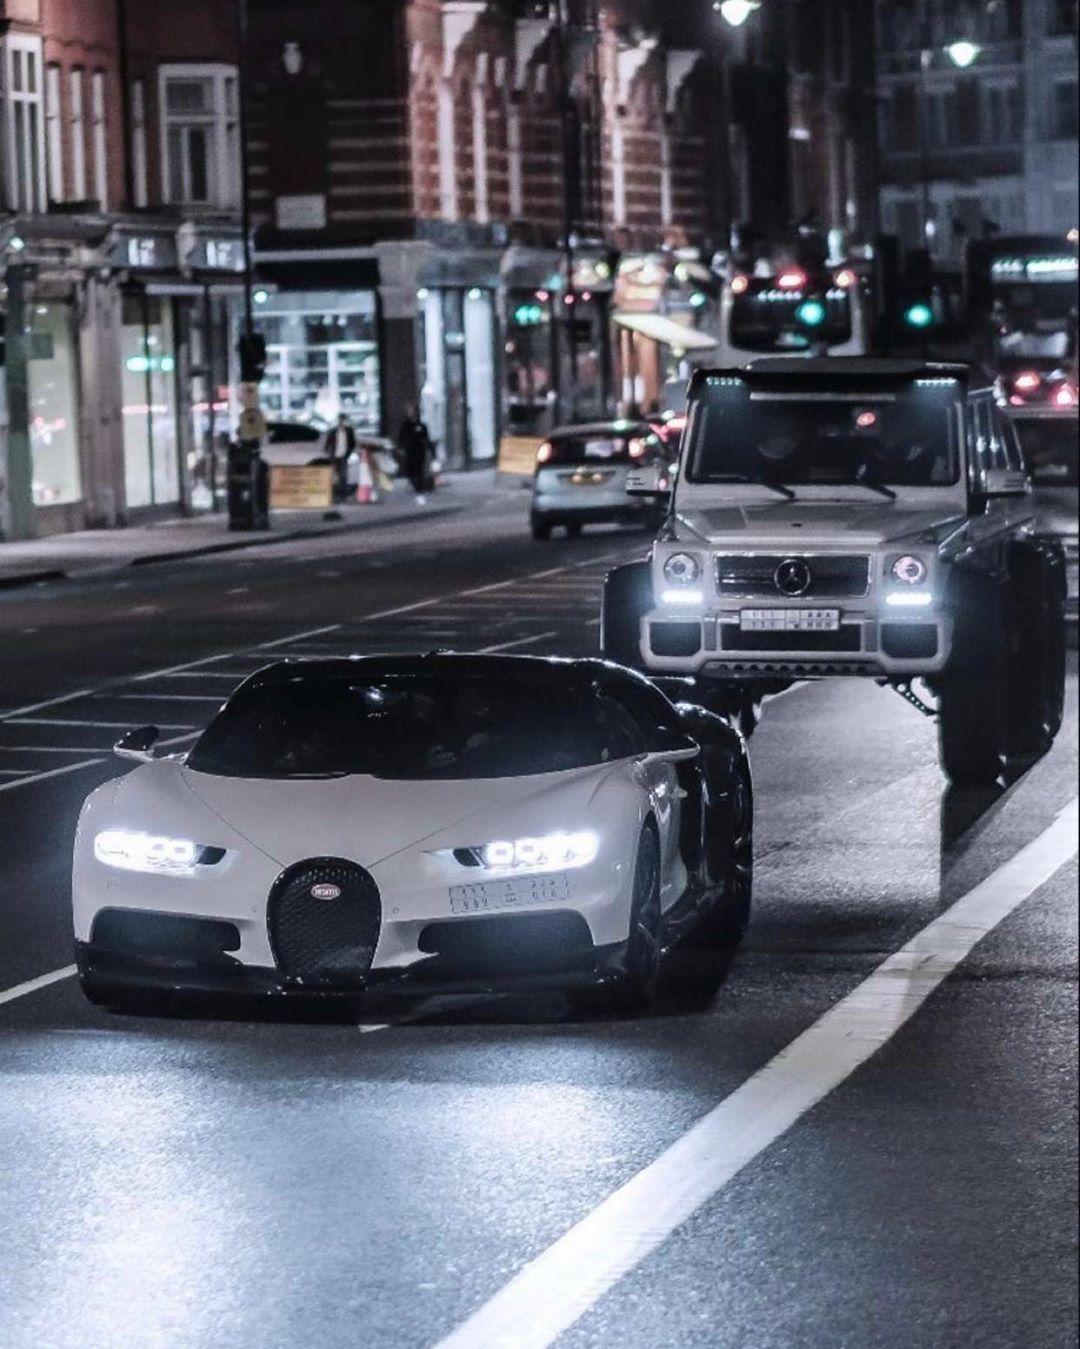 Car Cars Auto Carporn Speed Bmw Love Drive Sportscar Luxury Photography Supercar Vehicle Street Exoticcars Raci In 2020 Bugatti Cars Bugatti Dream Cars